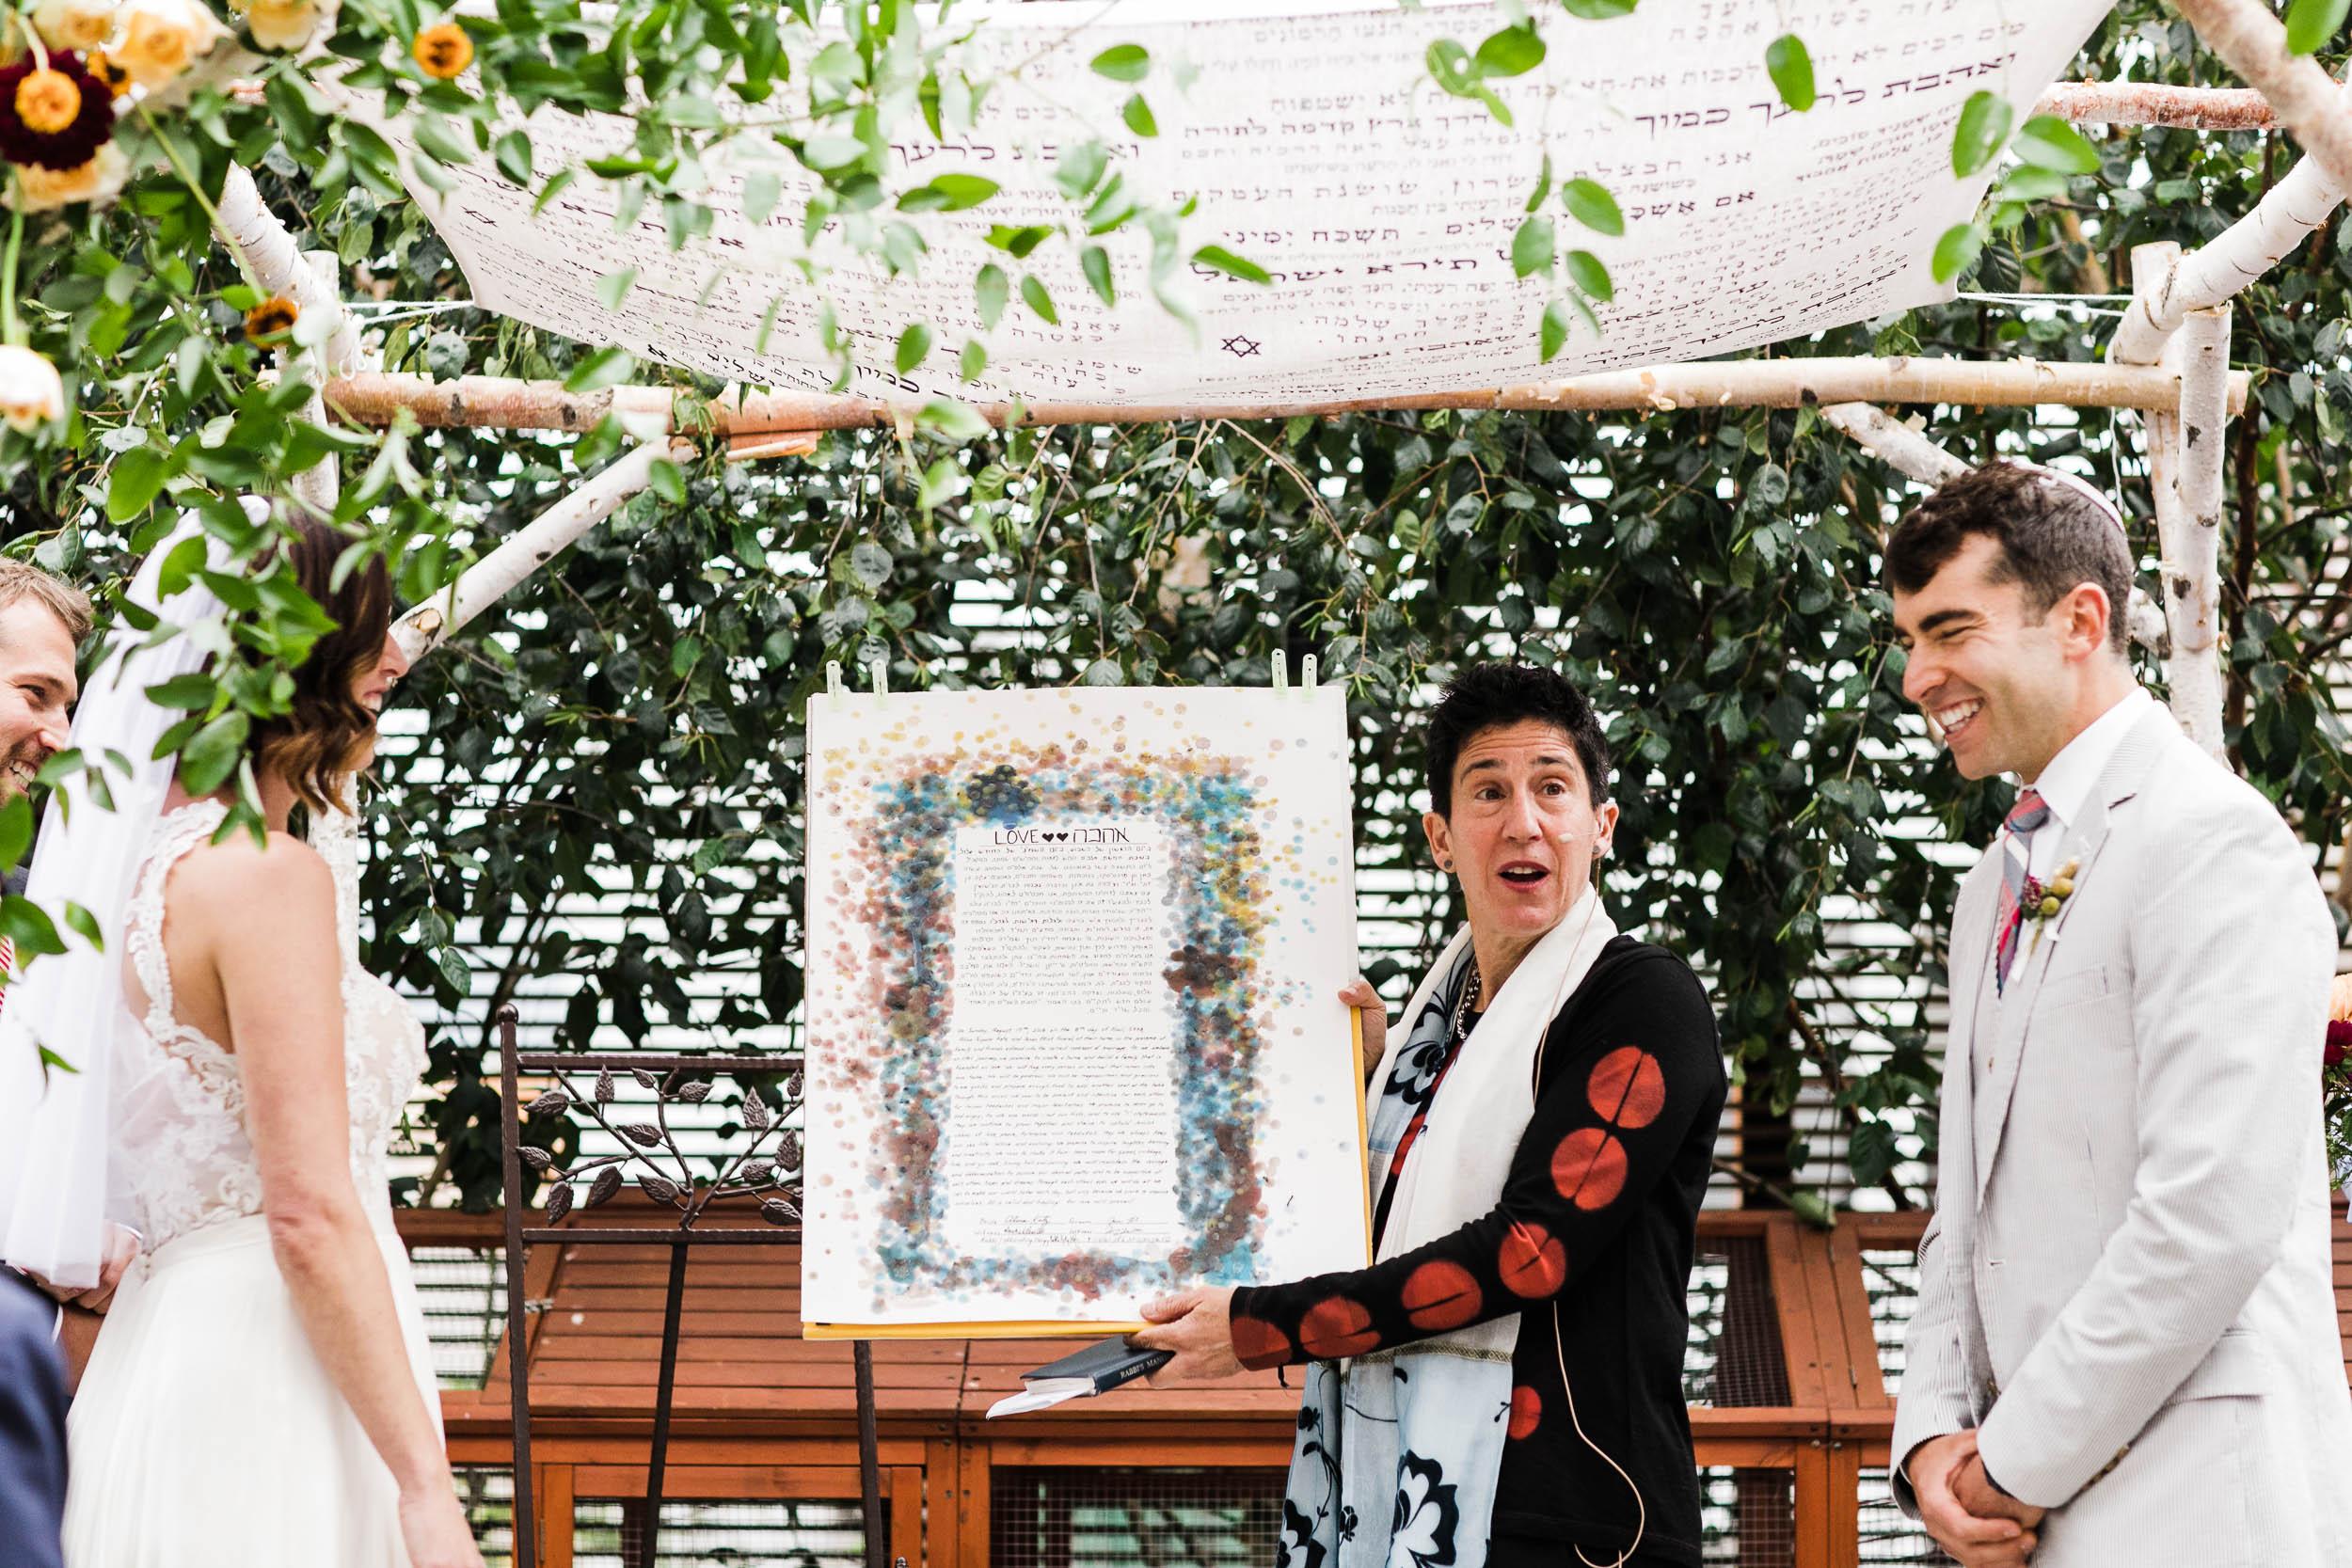 081818_Alina Jason San Francisco Wedding_Buena Lane Photography_1232 copy.jpg